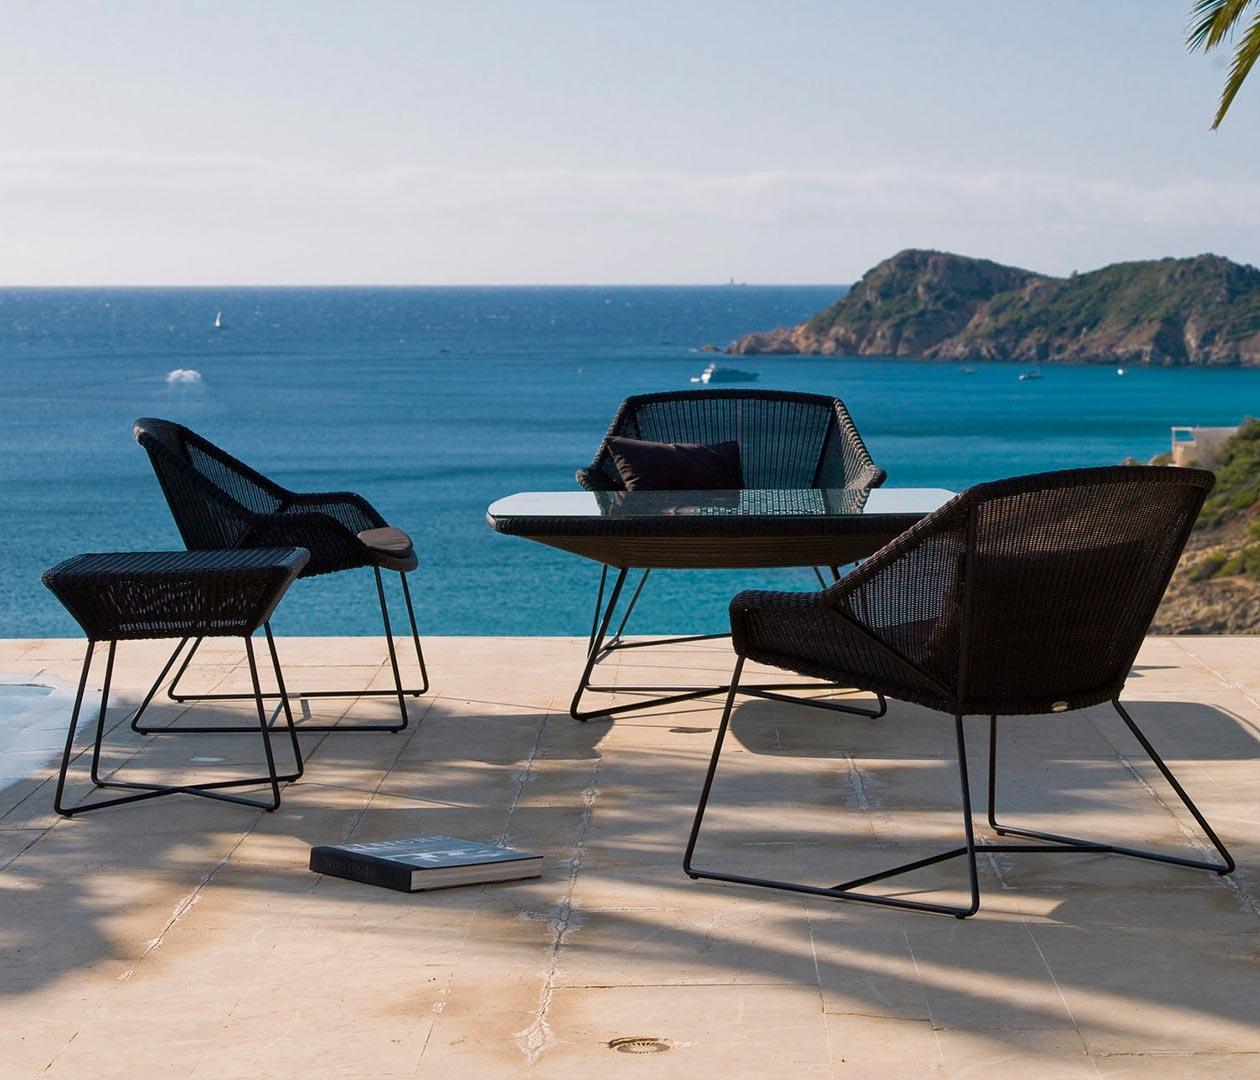 Breeze loungefåtölj från Cane-line.